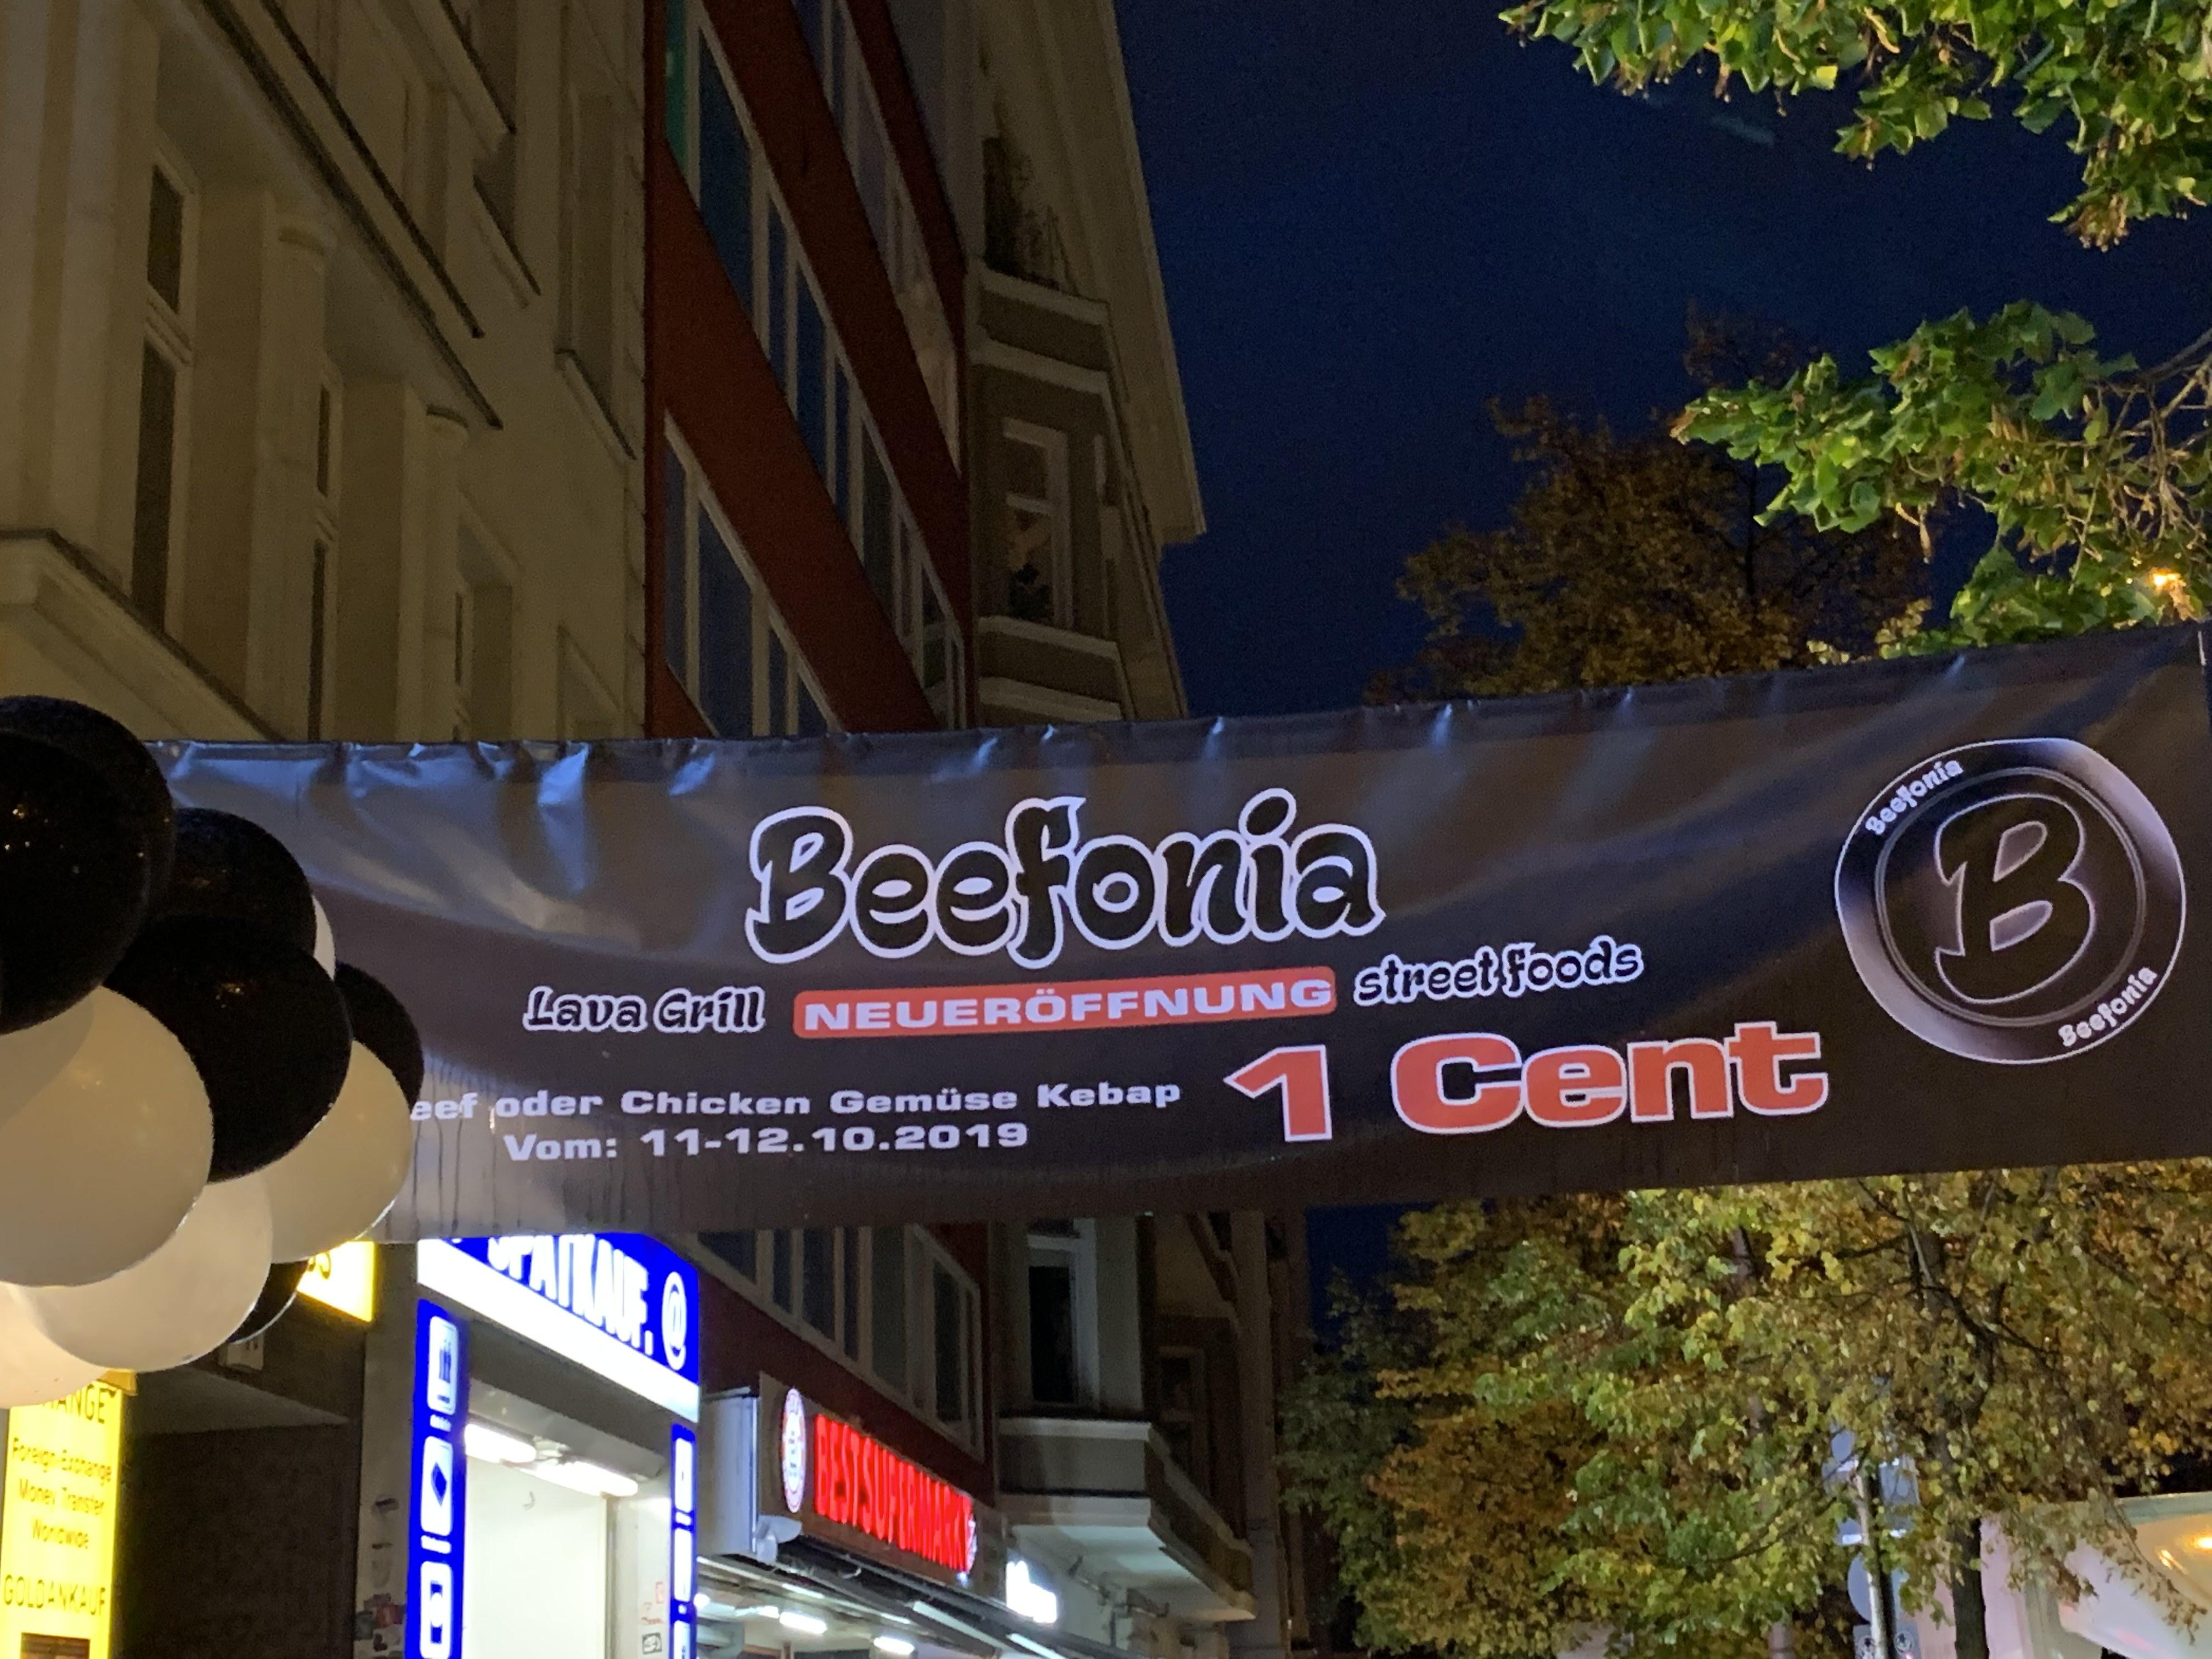 Döner 1 Cent - Beefonia Neueröffnung   Berlin